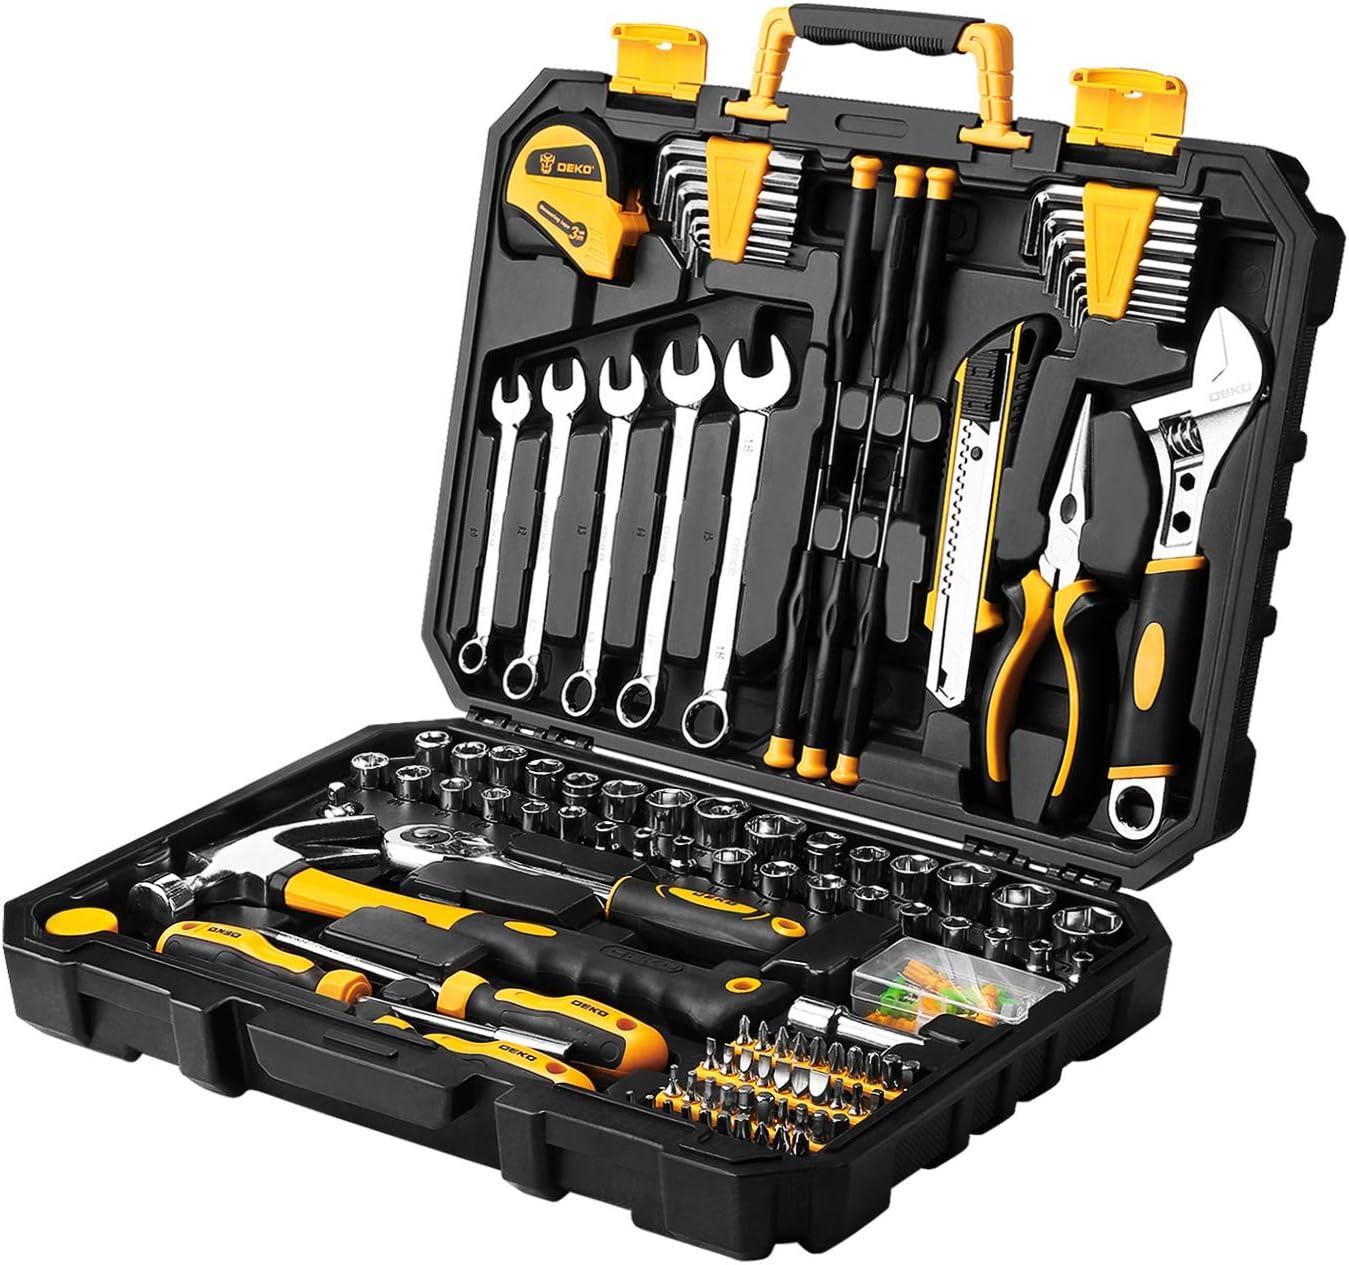 DEKOPRO 20 Piece Tool Set General Household Hand Tool Kit,Auto Repair Tool  Set, with Plastic Toolbox Storage Case